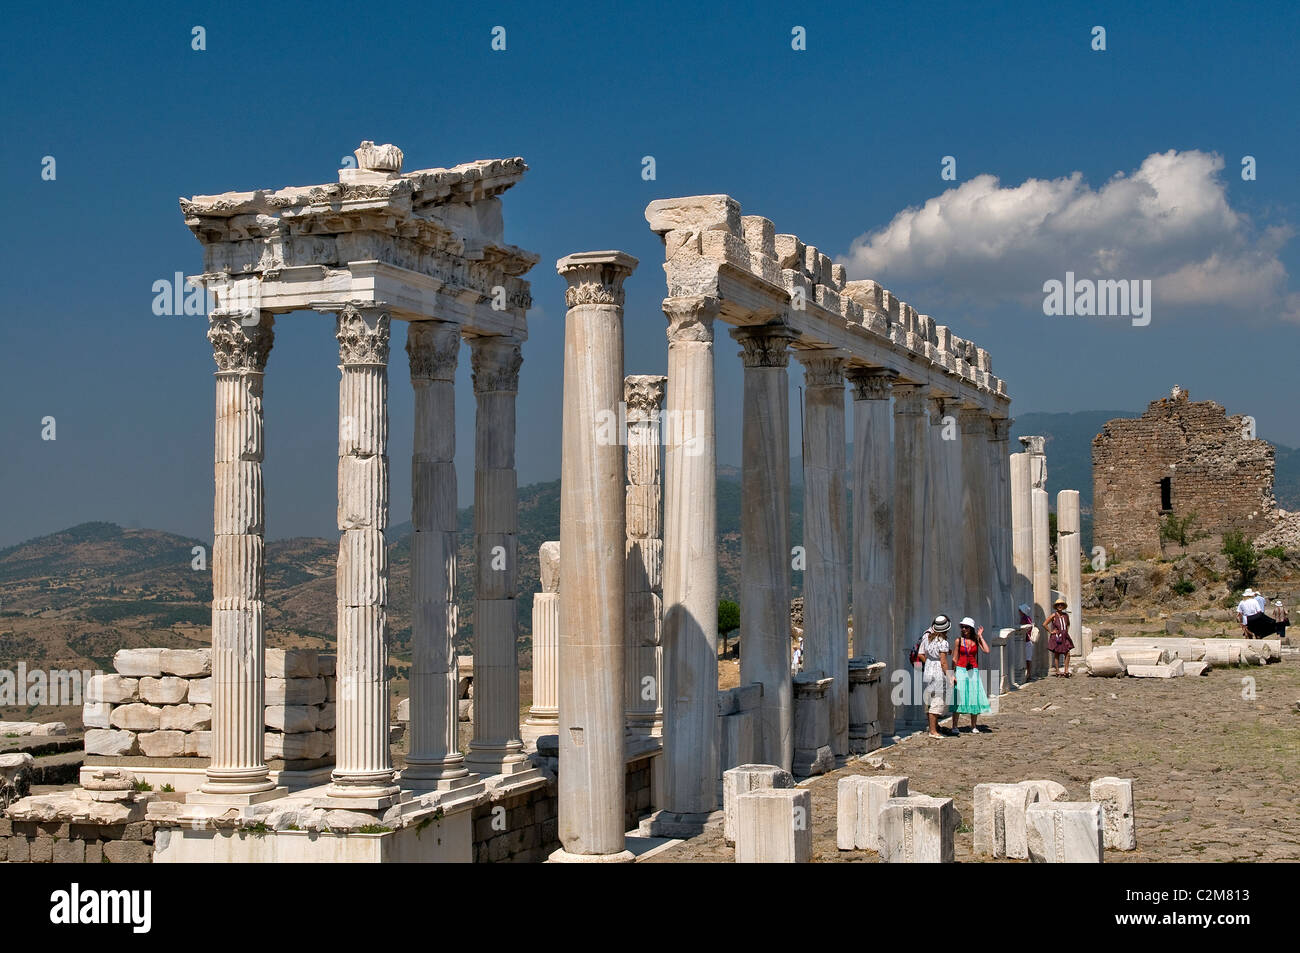 Die Ruinen des Tempels von Trajan in Pergamon Bergama Türkei Stockbild